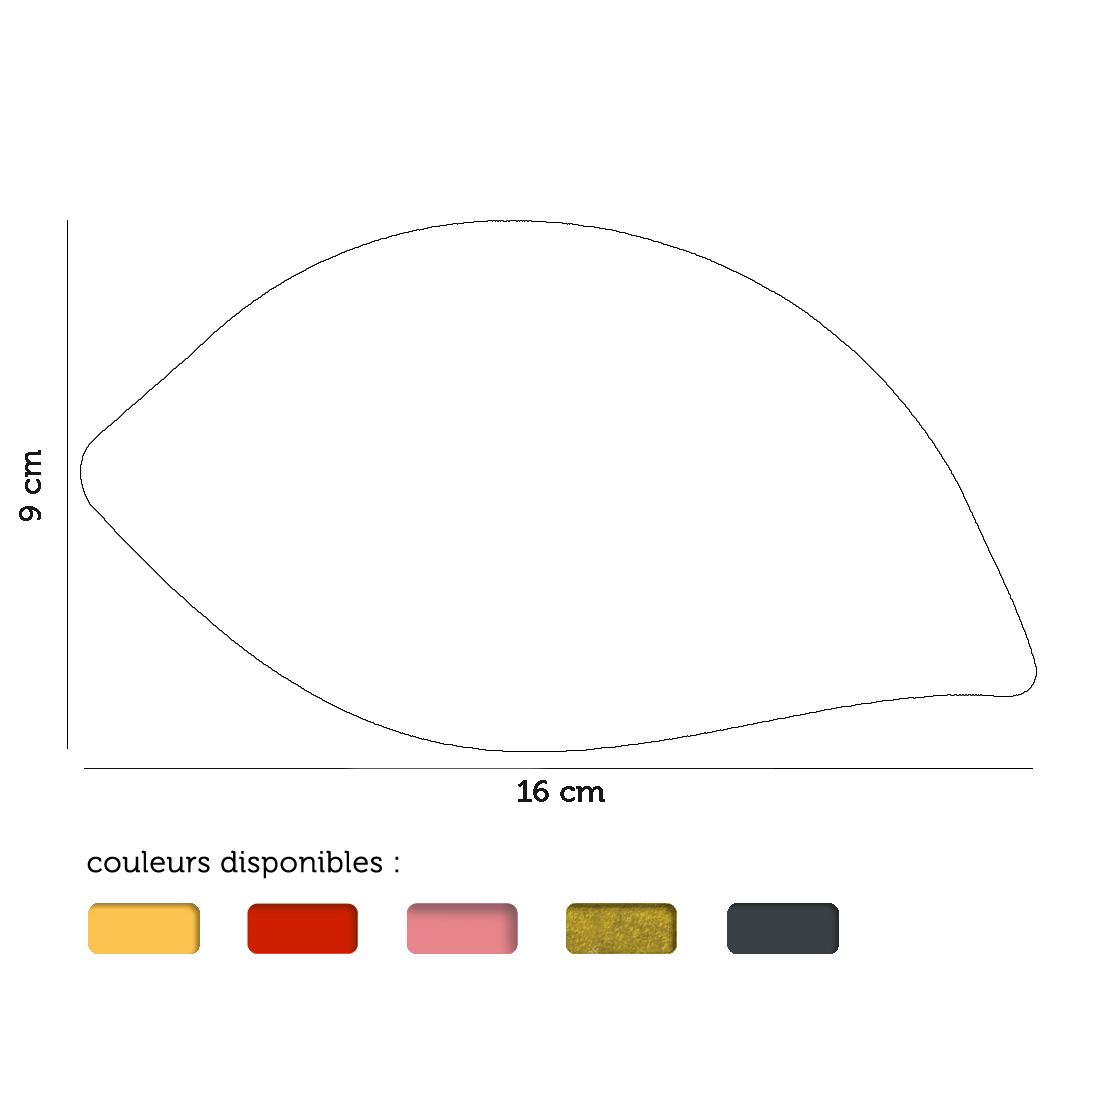 Lemon dimensions, Virvoltan thin lacquered blade